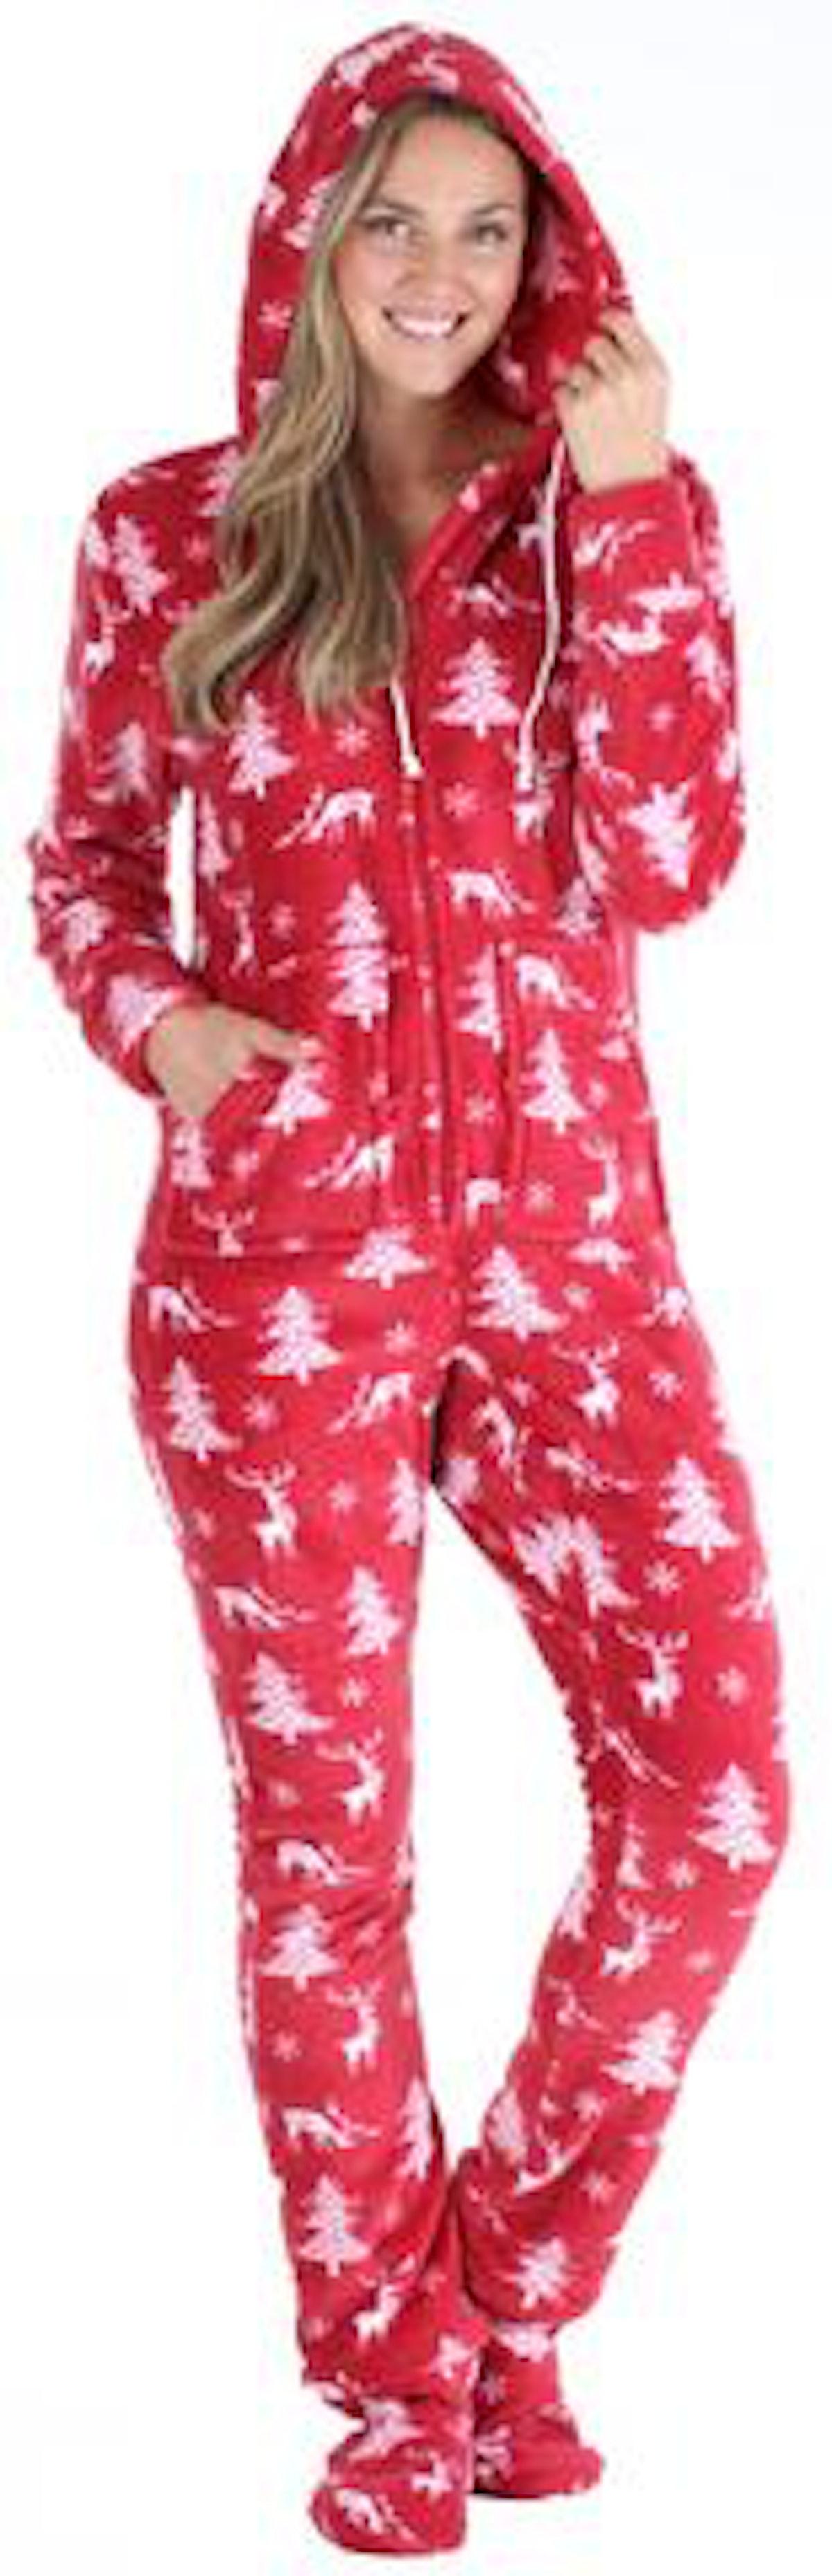 SleepytimePjs Family Matching Fleece Cranberry Deer Onesie Hooded Footed Pajama